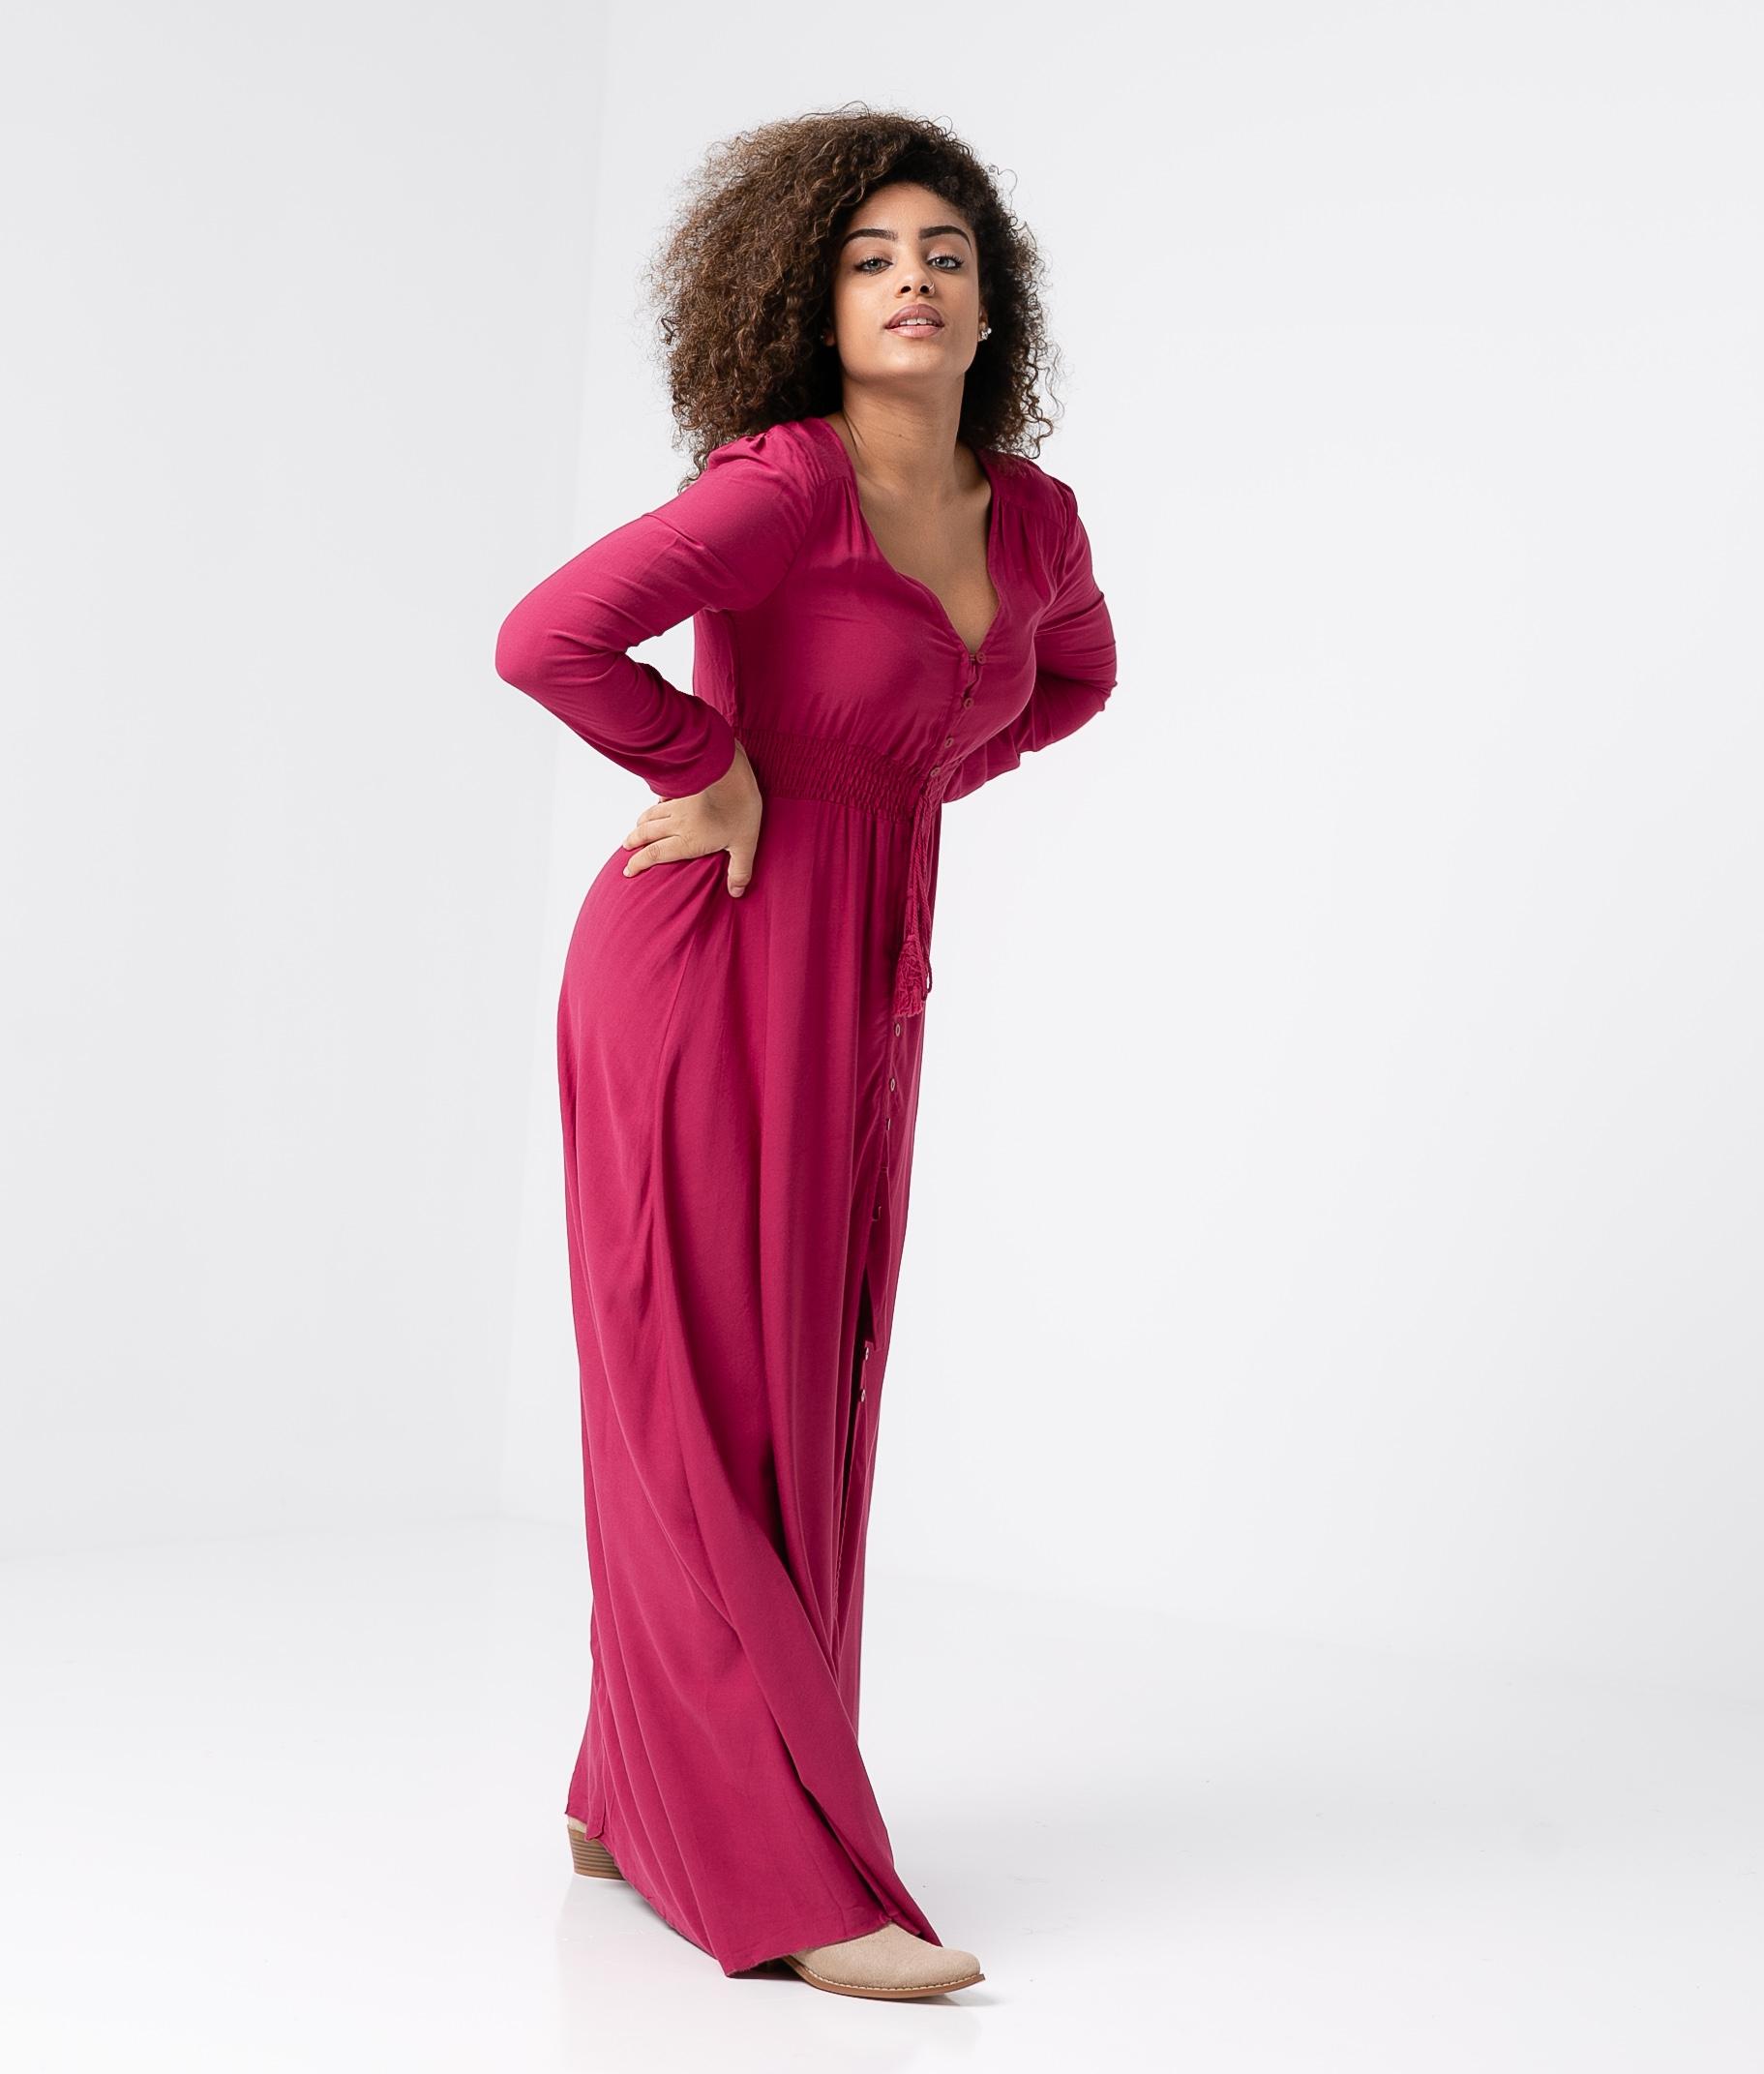 Vestido Kaydy - Buganvilla